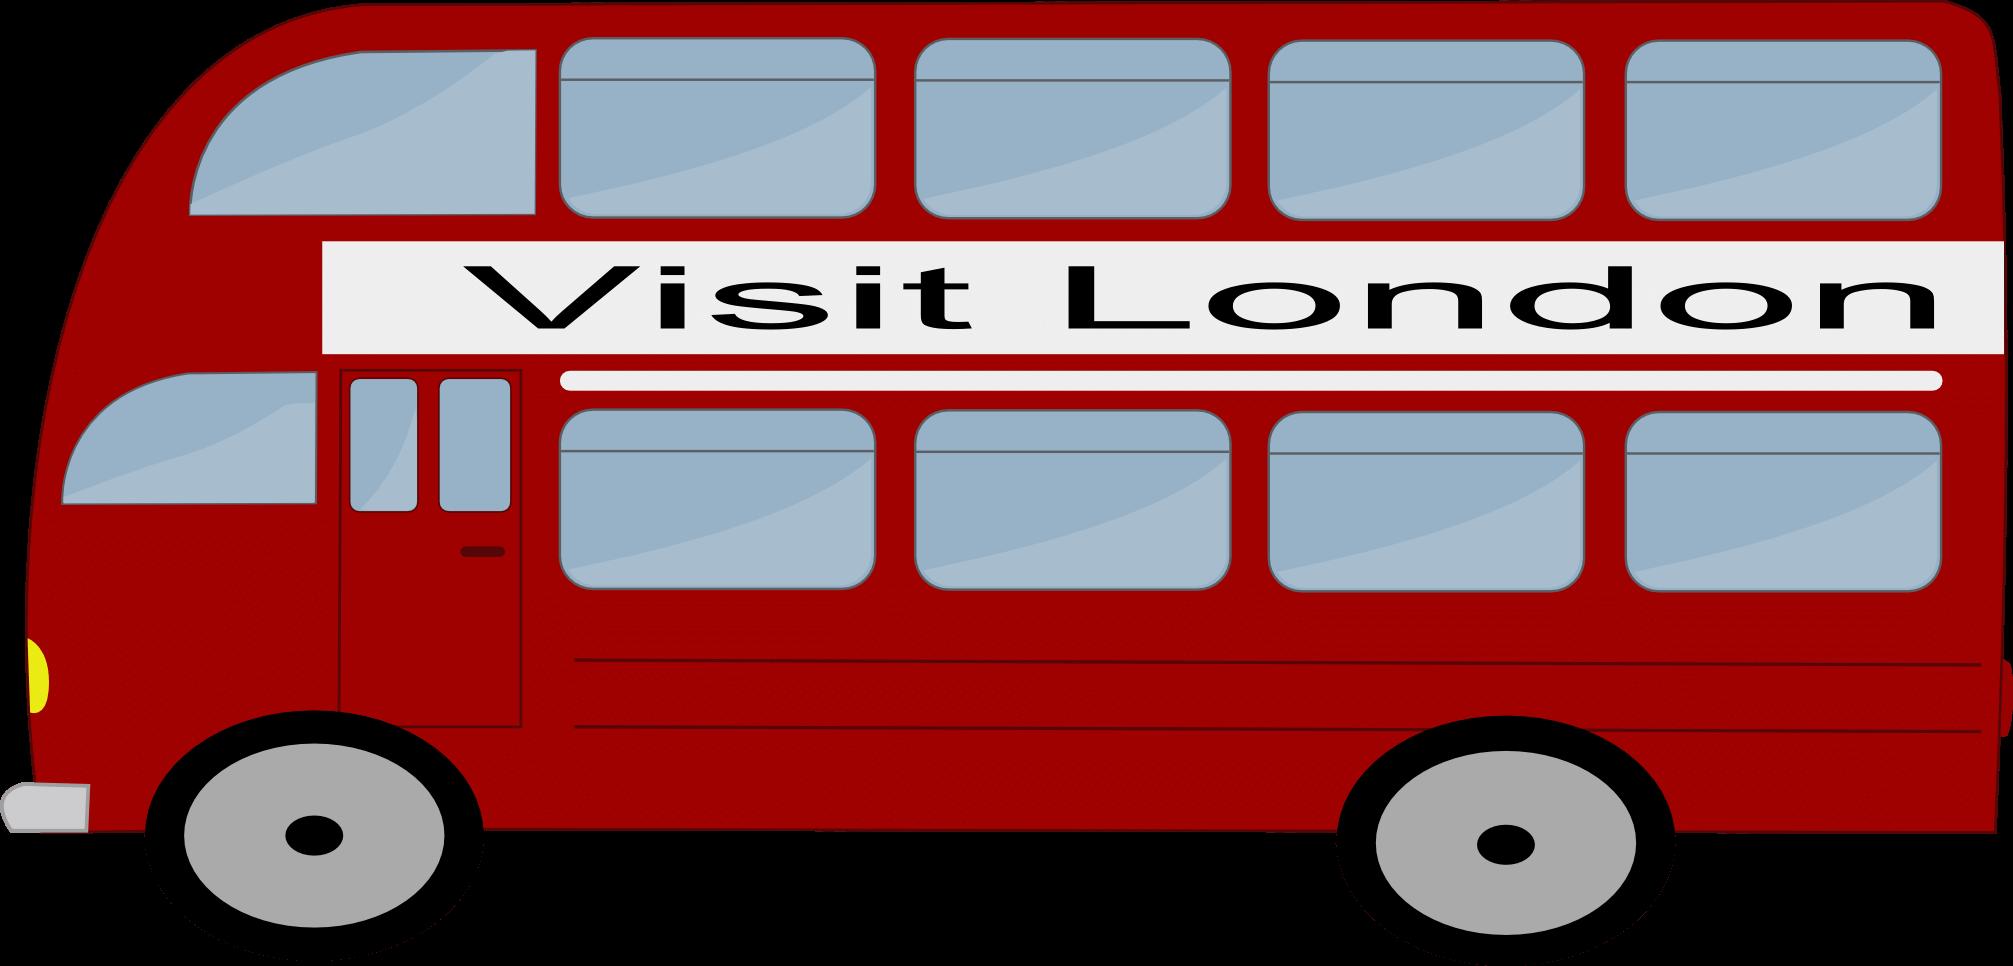 Bus bus london